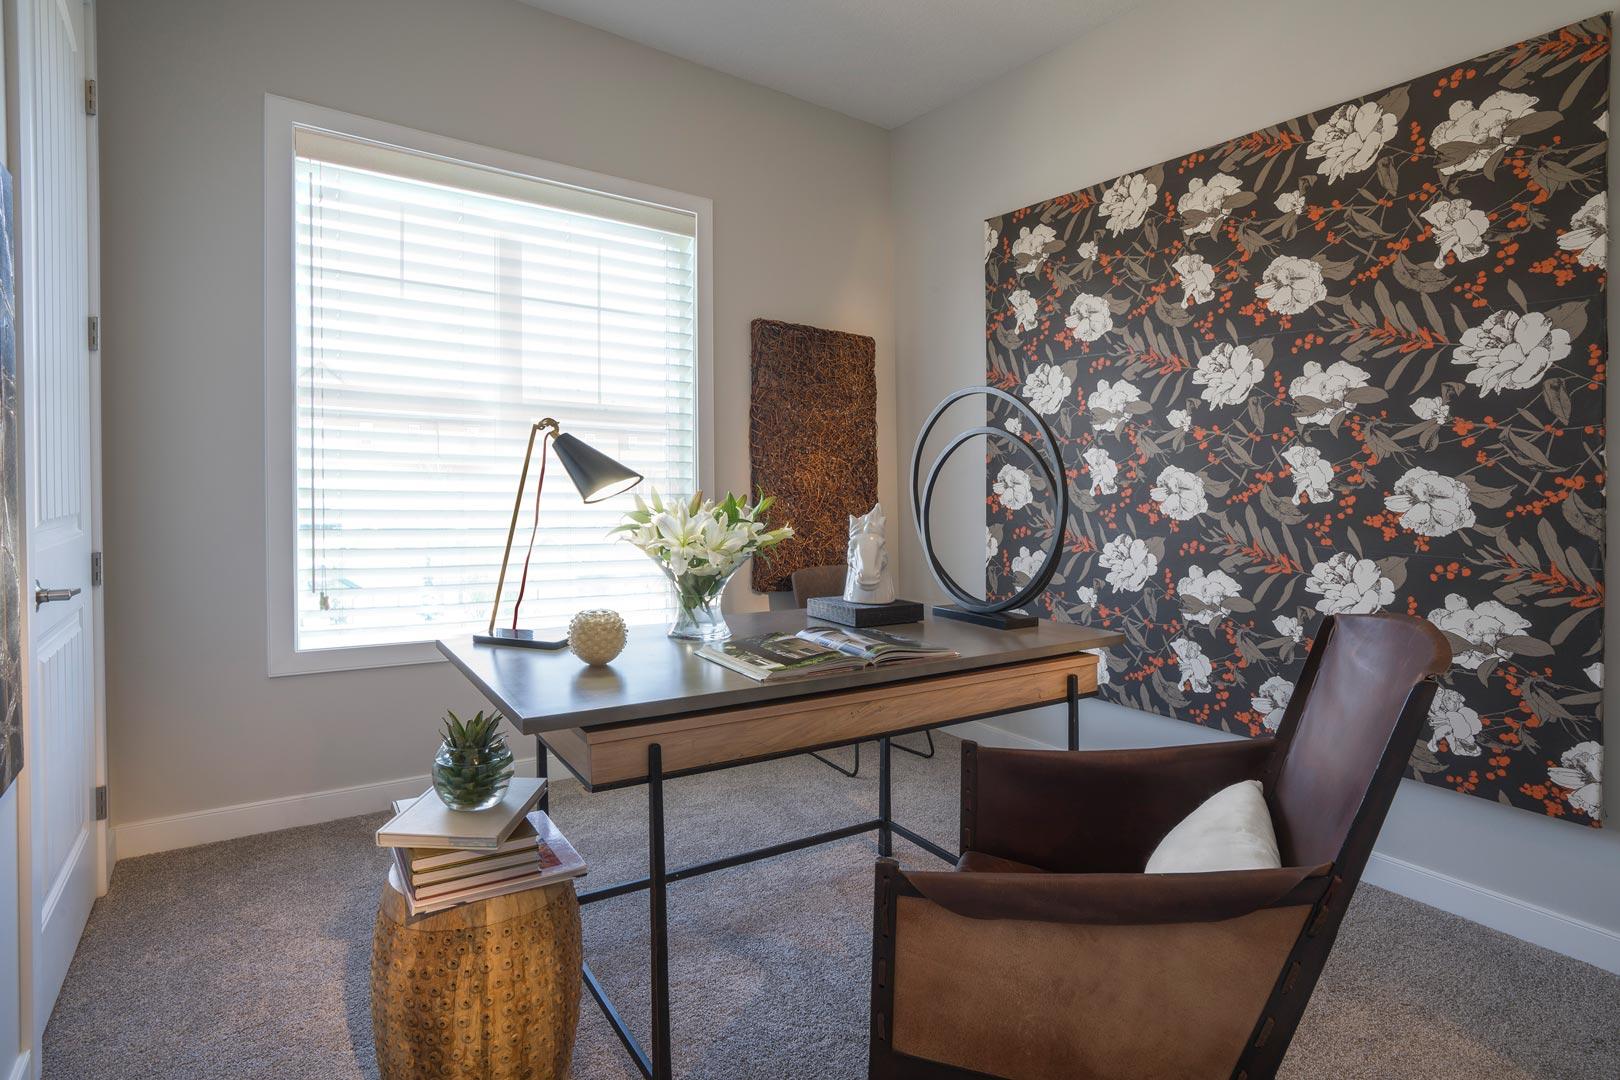 Douglas Homes Interior Image - Home Office